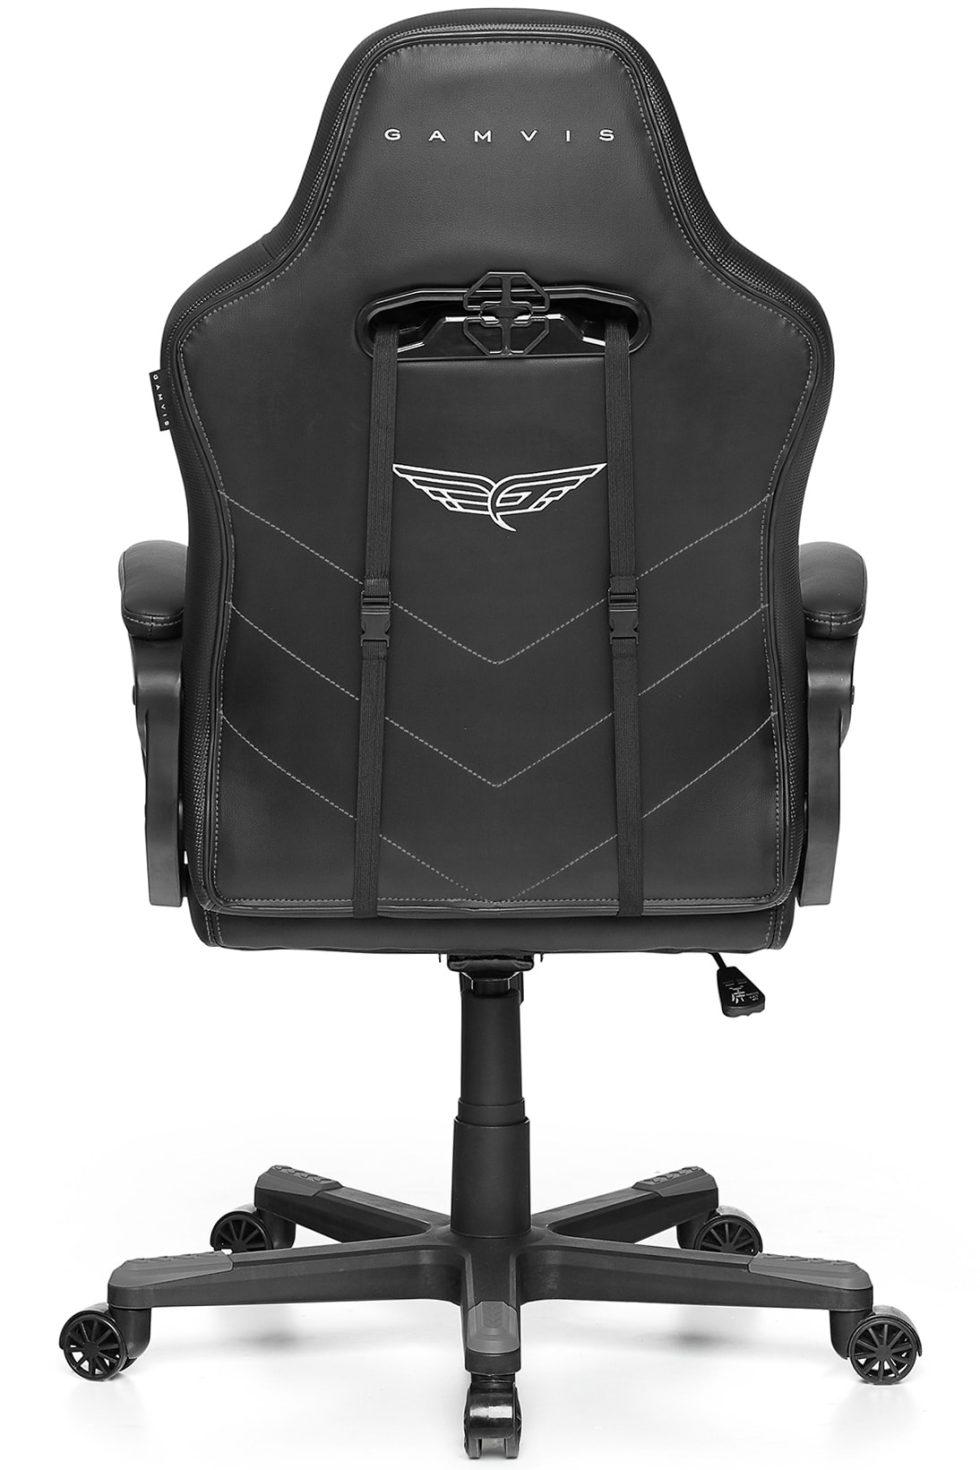 Materiałowy Fotel gamingowy Gamvis Hyper Szary 1